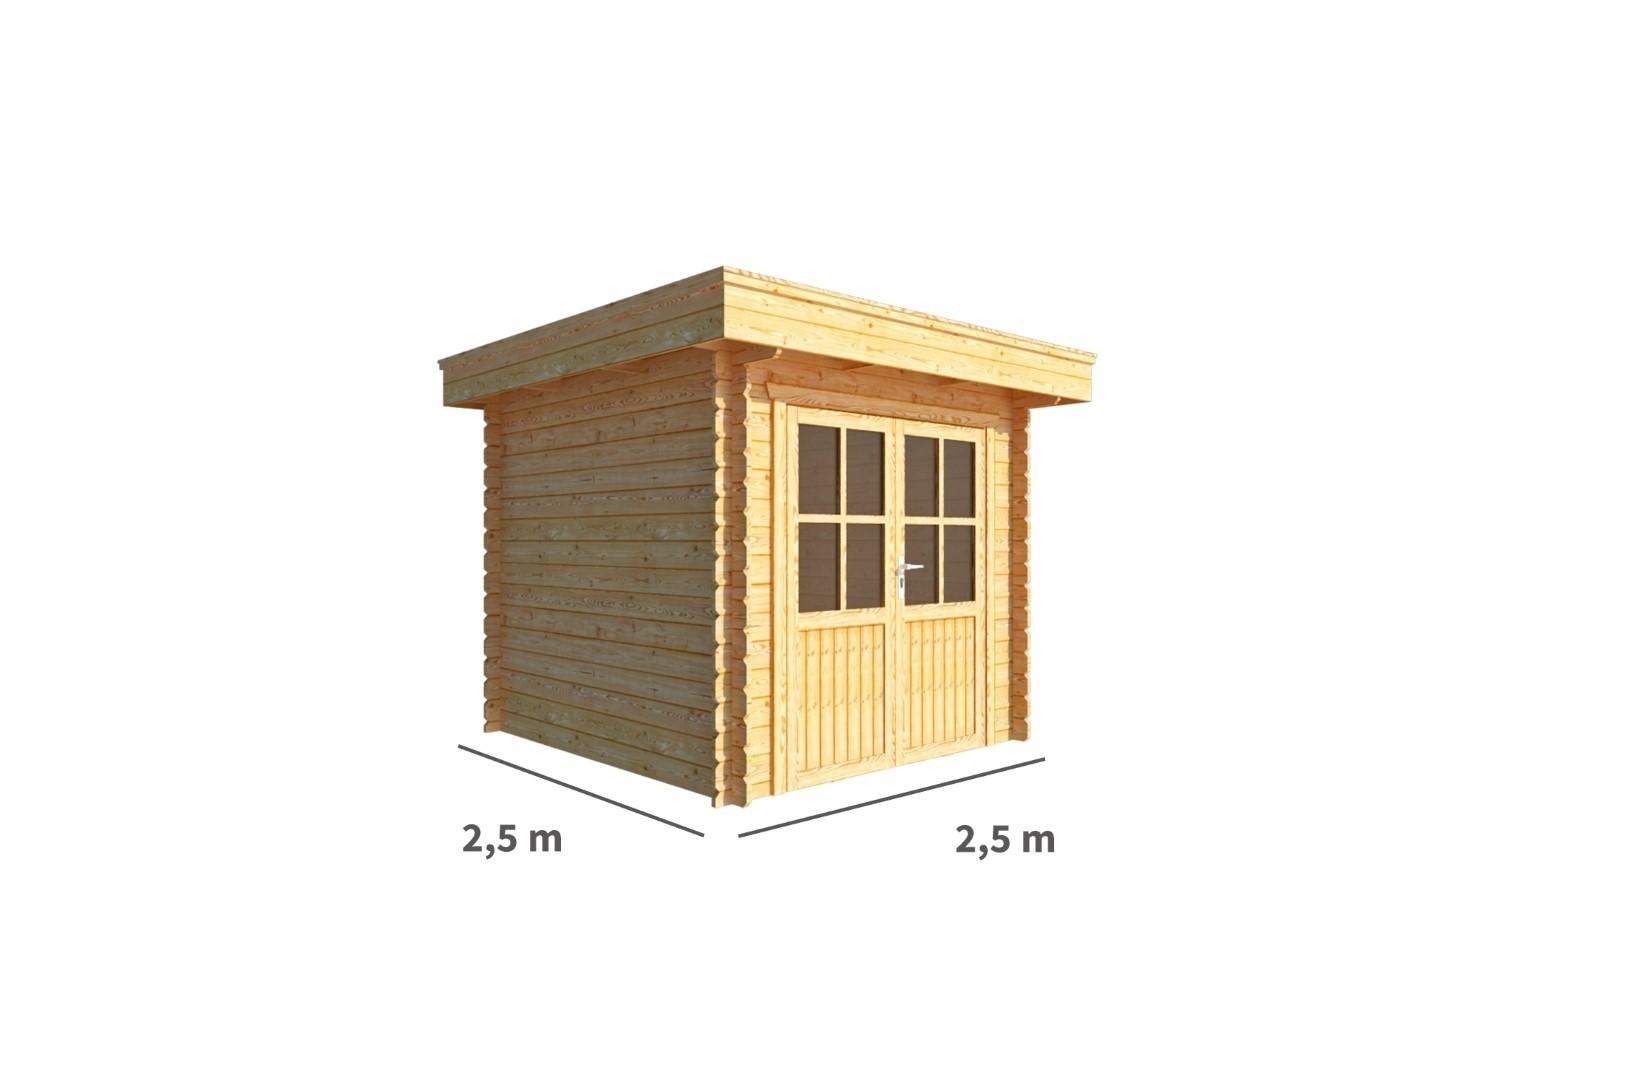 Tuinhuisje Blokhut Lisa 250 cm bij 250 cm diep Plat dak